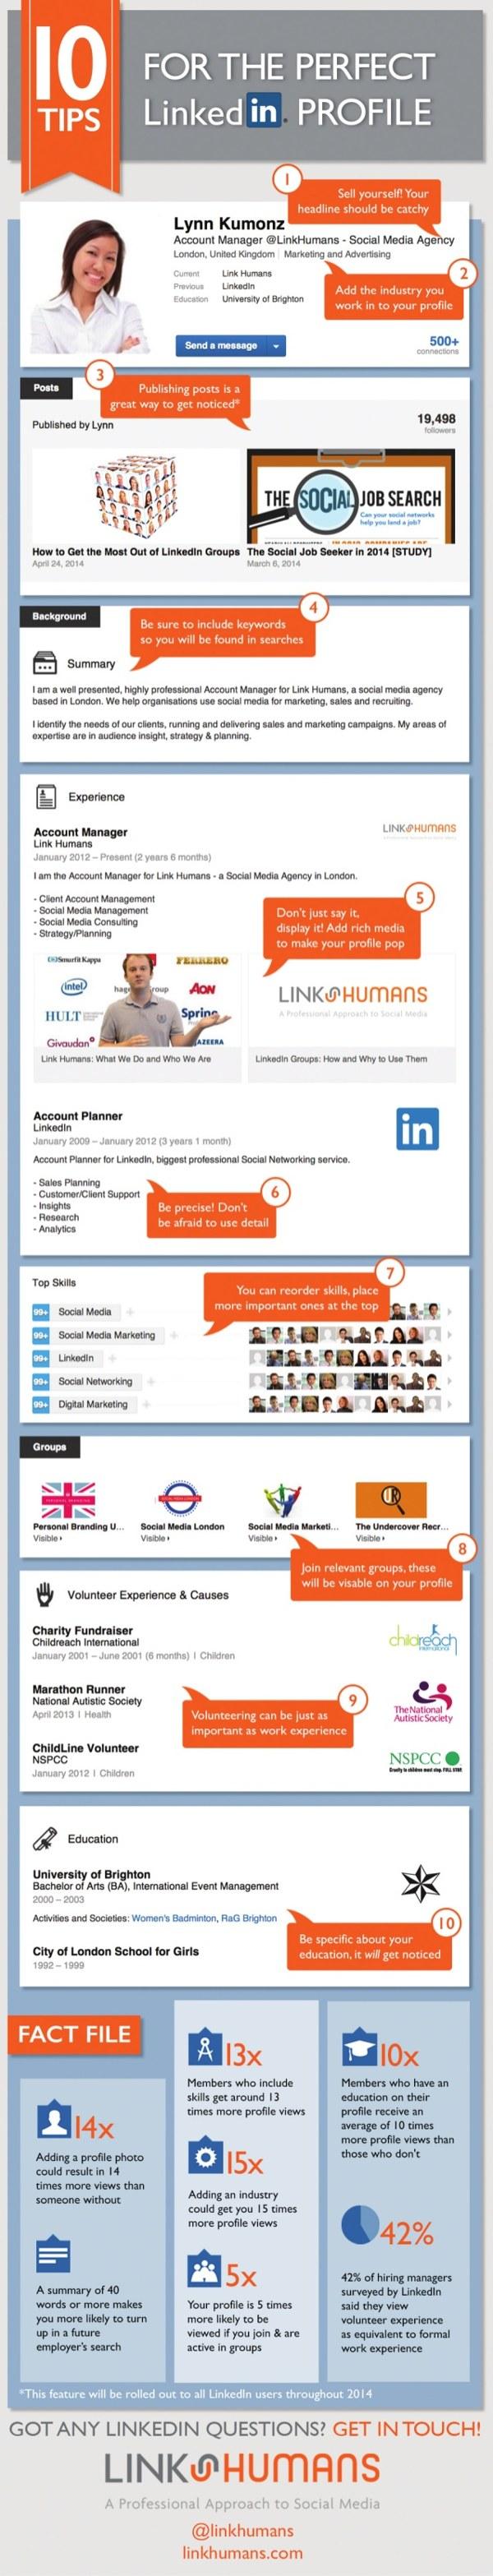 infografia-consejos-linkedin-perfil